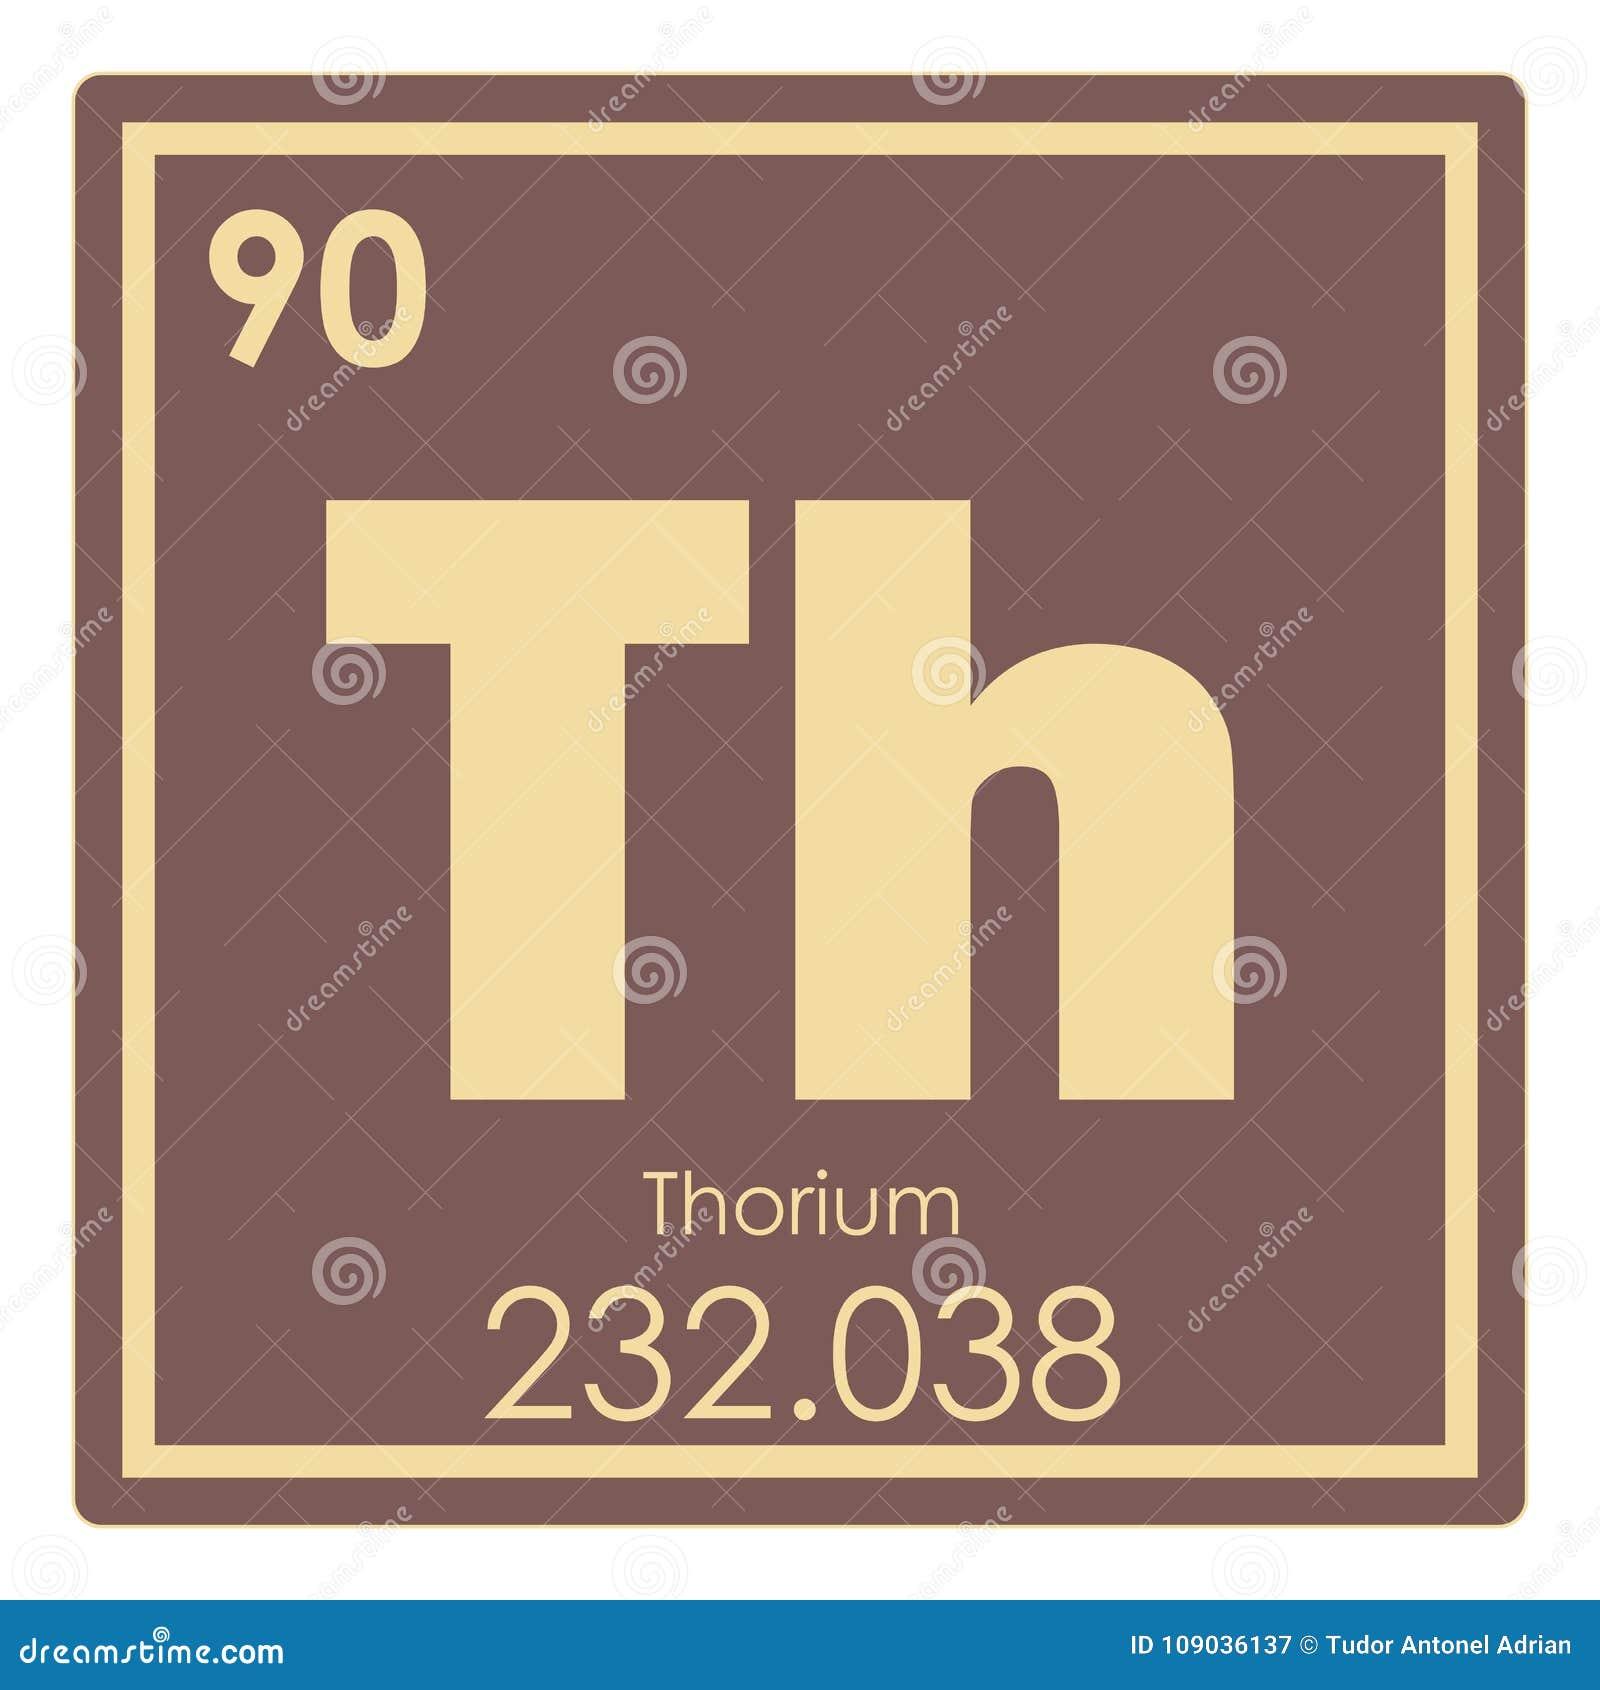 Thorium Chemical Element Stock Illustration Illustration Of